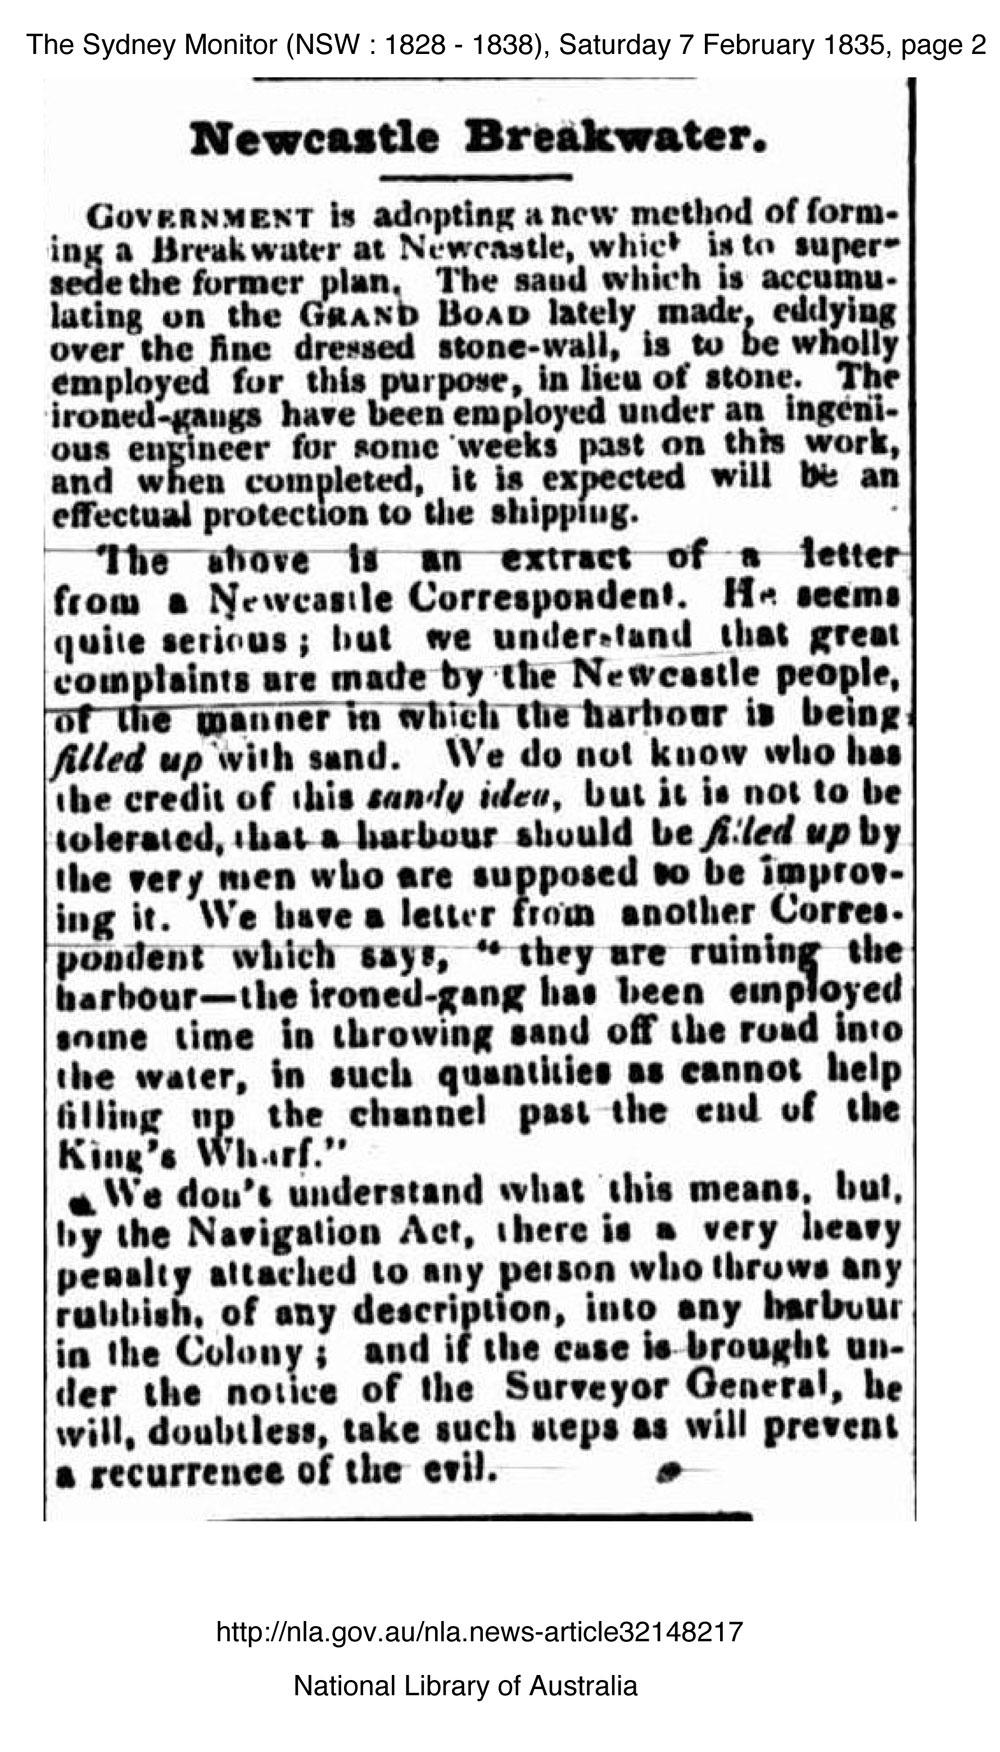 Newcastle Breakwater (Sydney Monitor 7th February 1835 p.2)